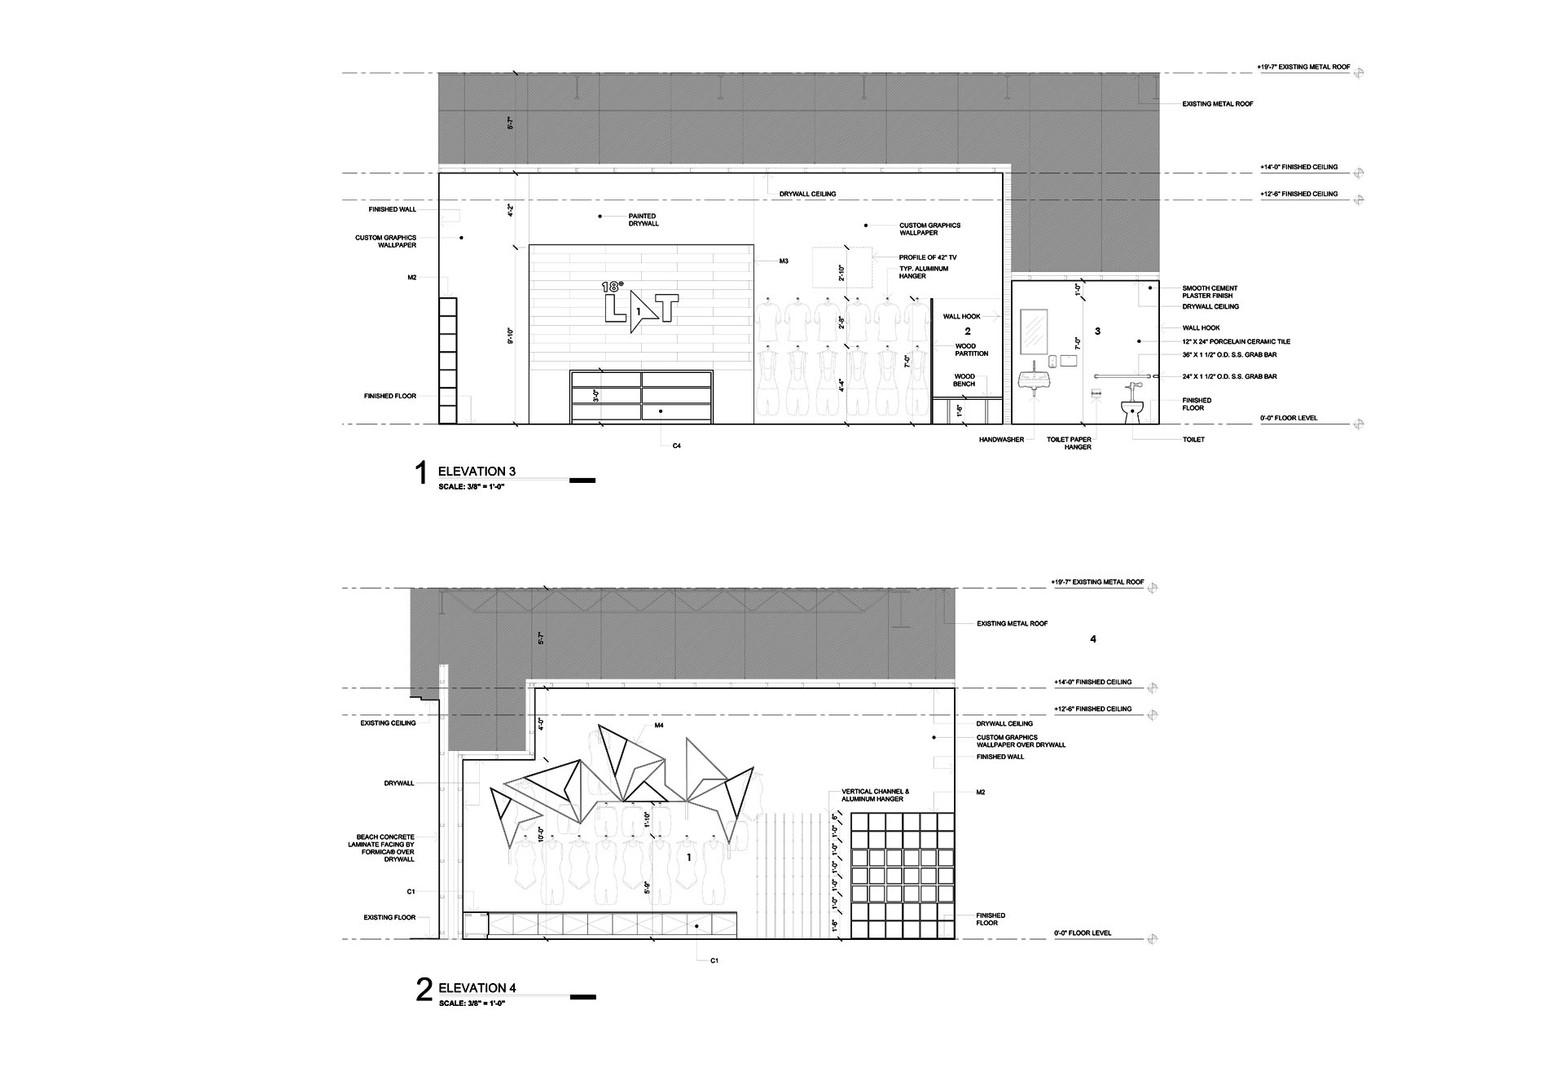 Interior Elevations 3 & 4